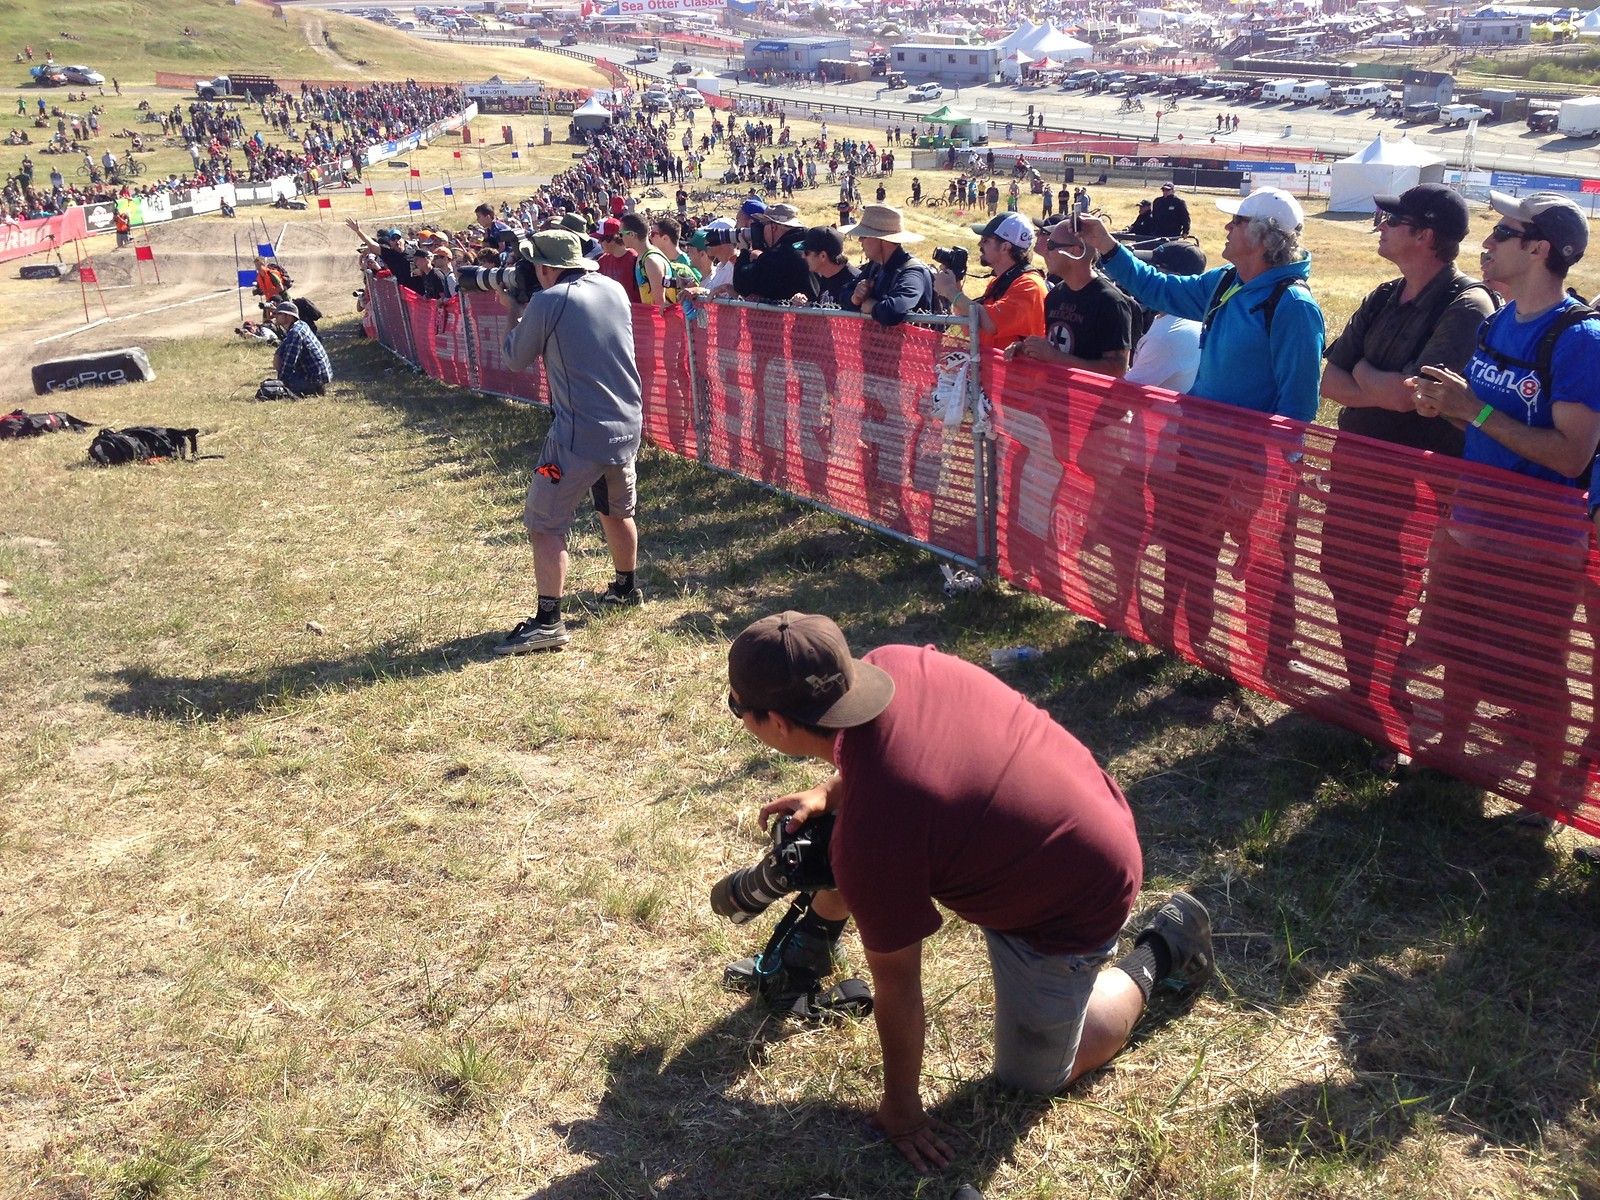 IMG 4236 - ska todd - Mountain Biking Pictures - Vital MTB